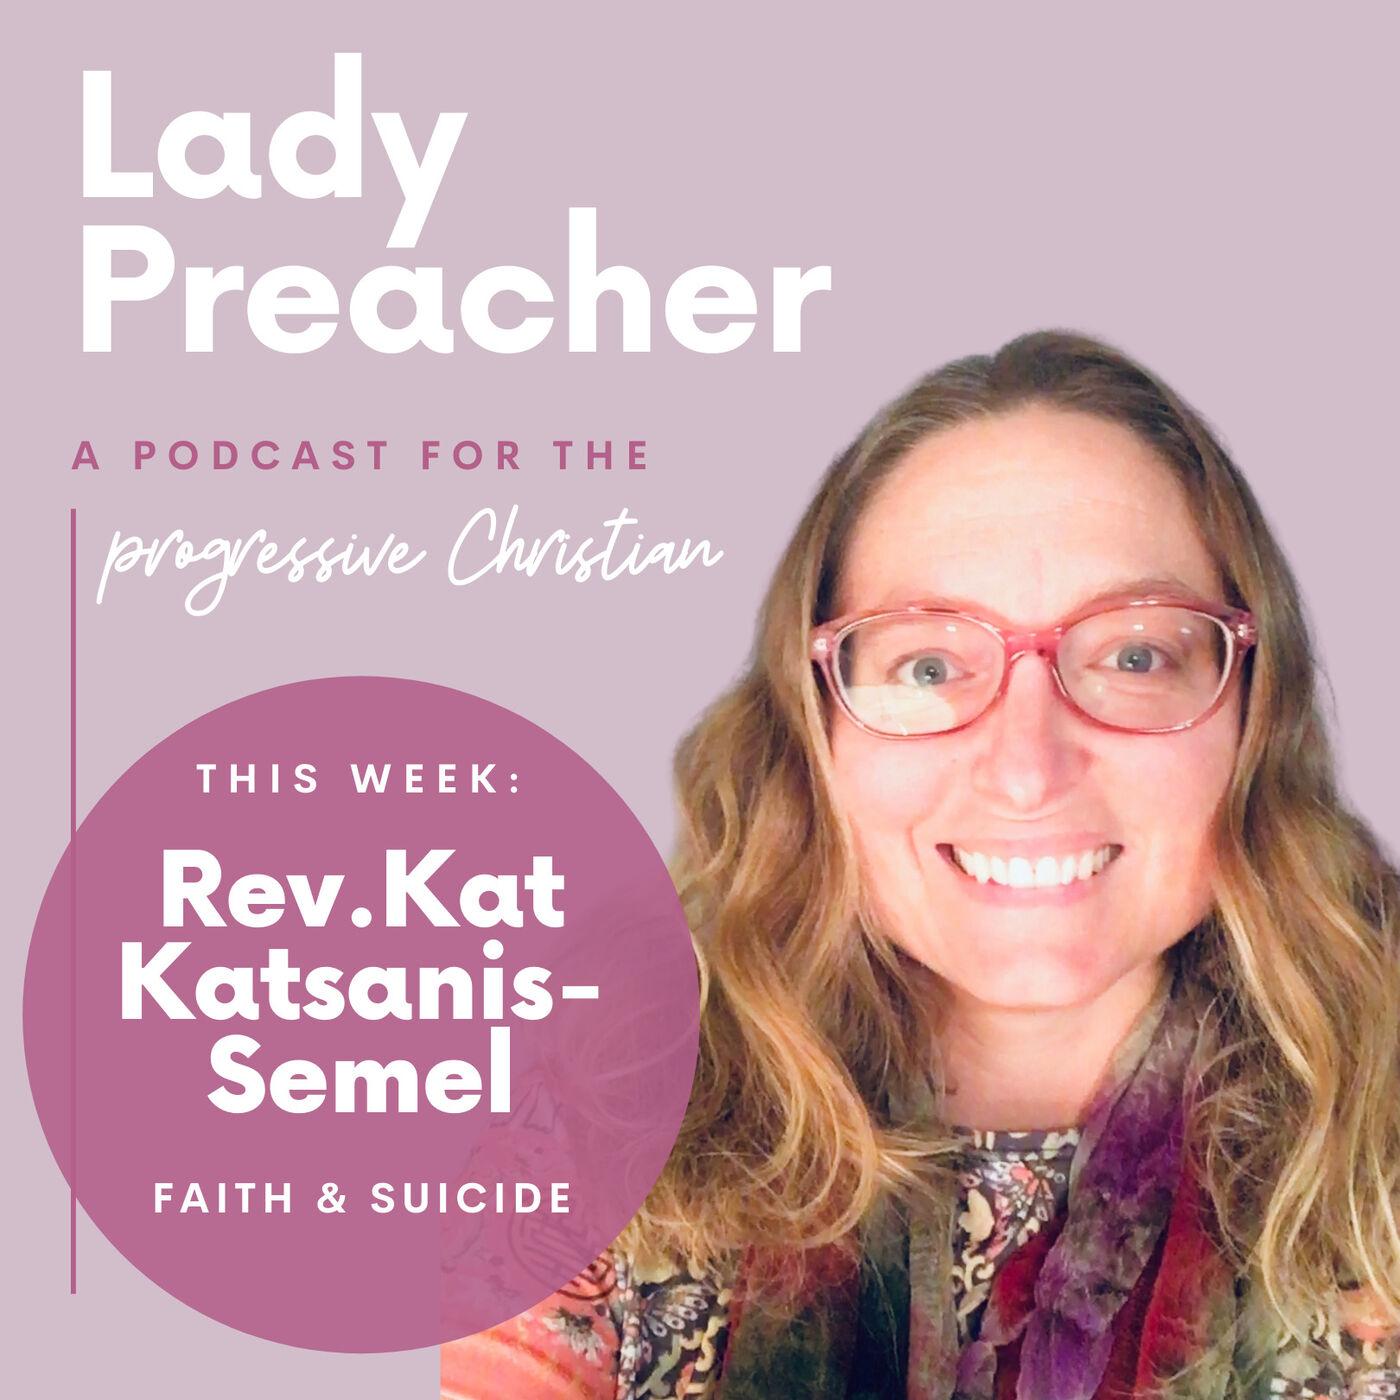 Rev. Kat Katsanis-Semel: Faith & Suicide